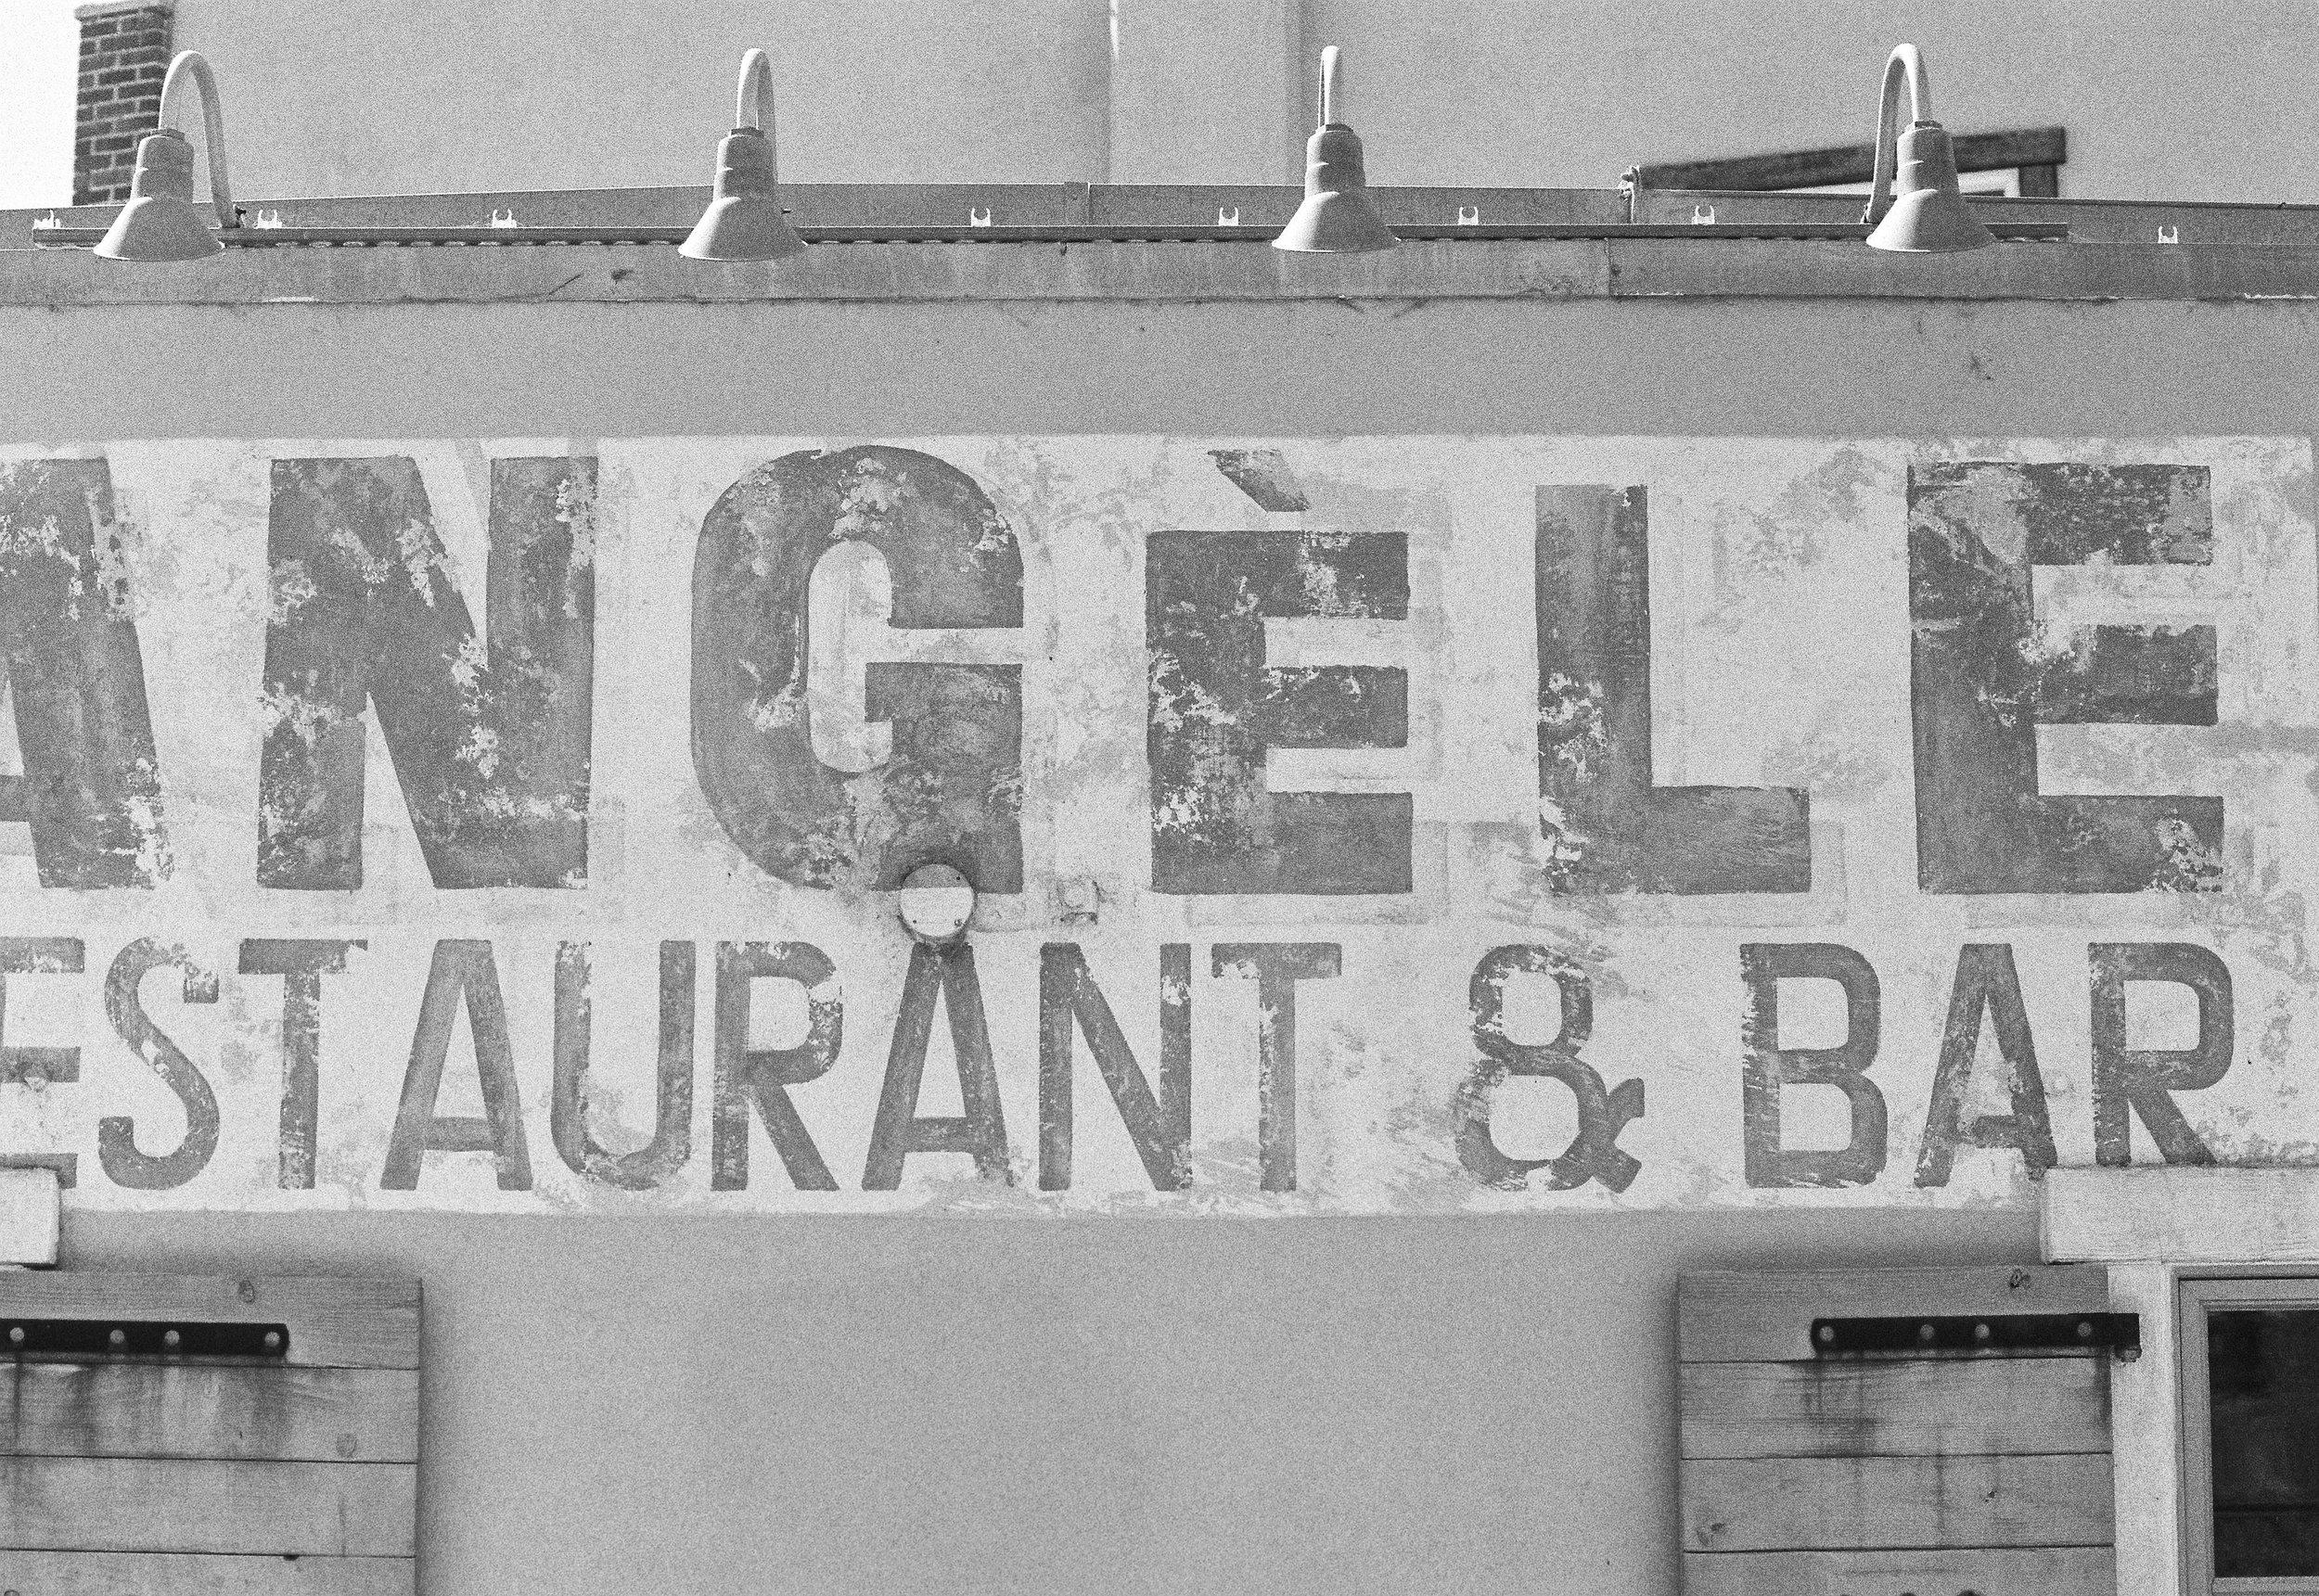 Angele.jpg